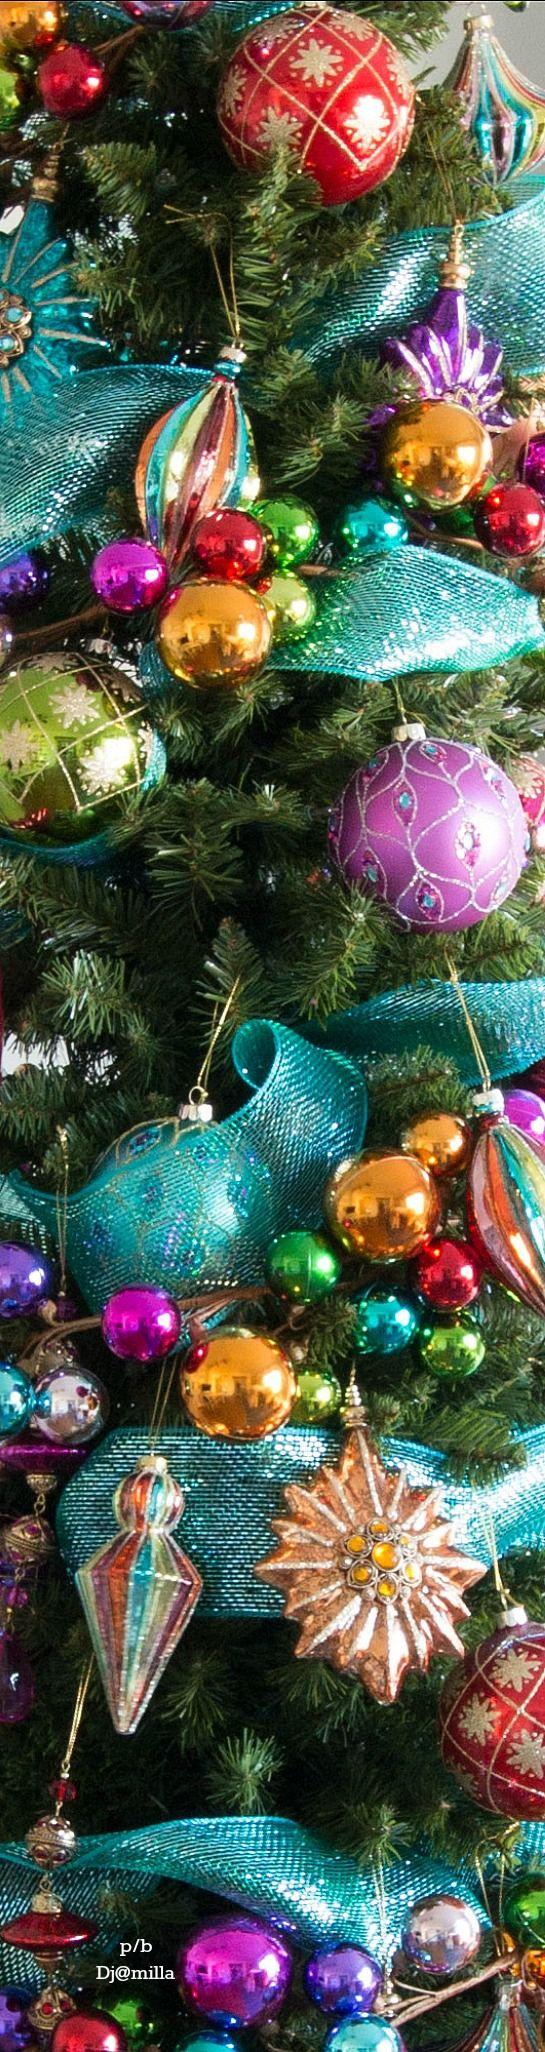 Germanic paganism amazing tabletop christmas trees decorating plan - Merry Christmas Tree